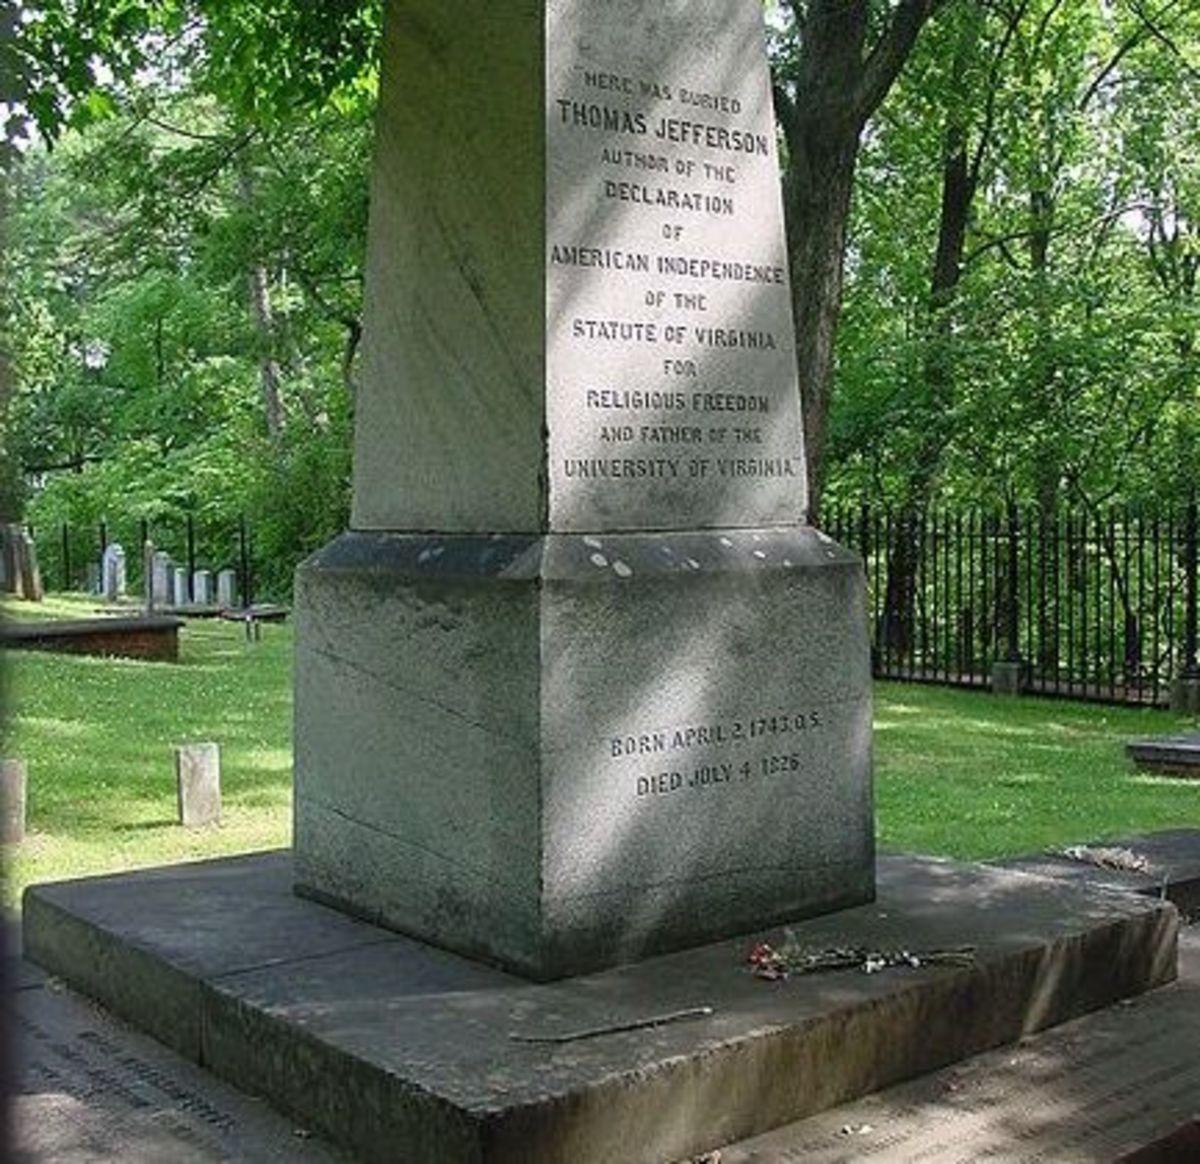 Jefferson's gravesite